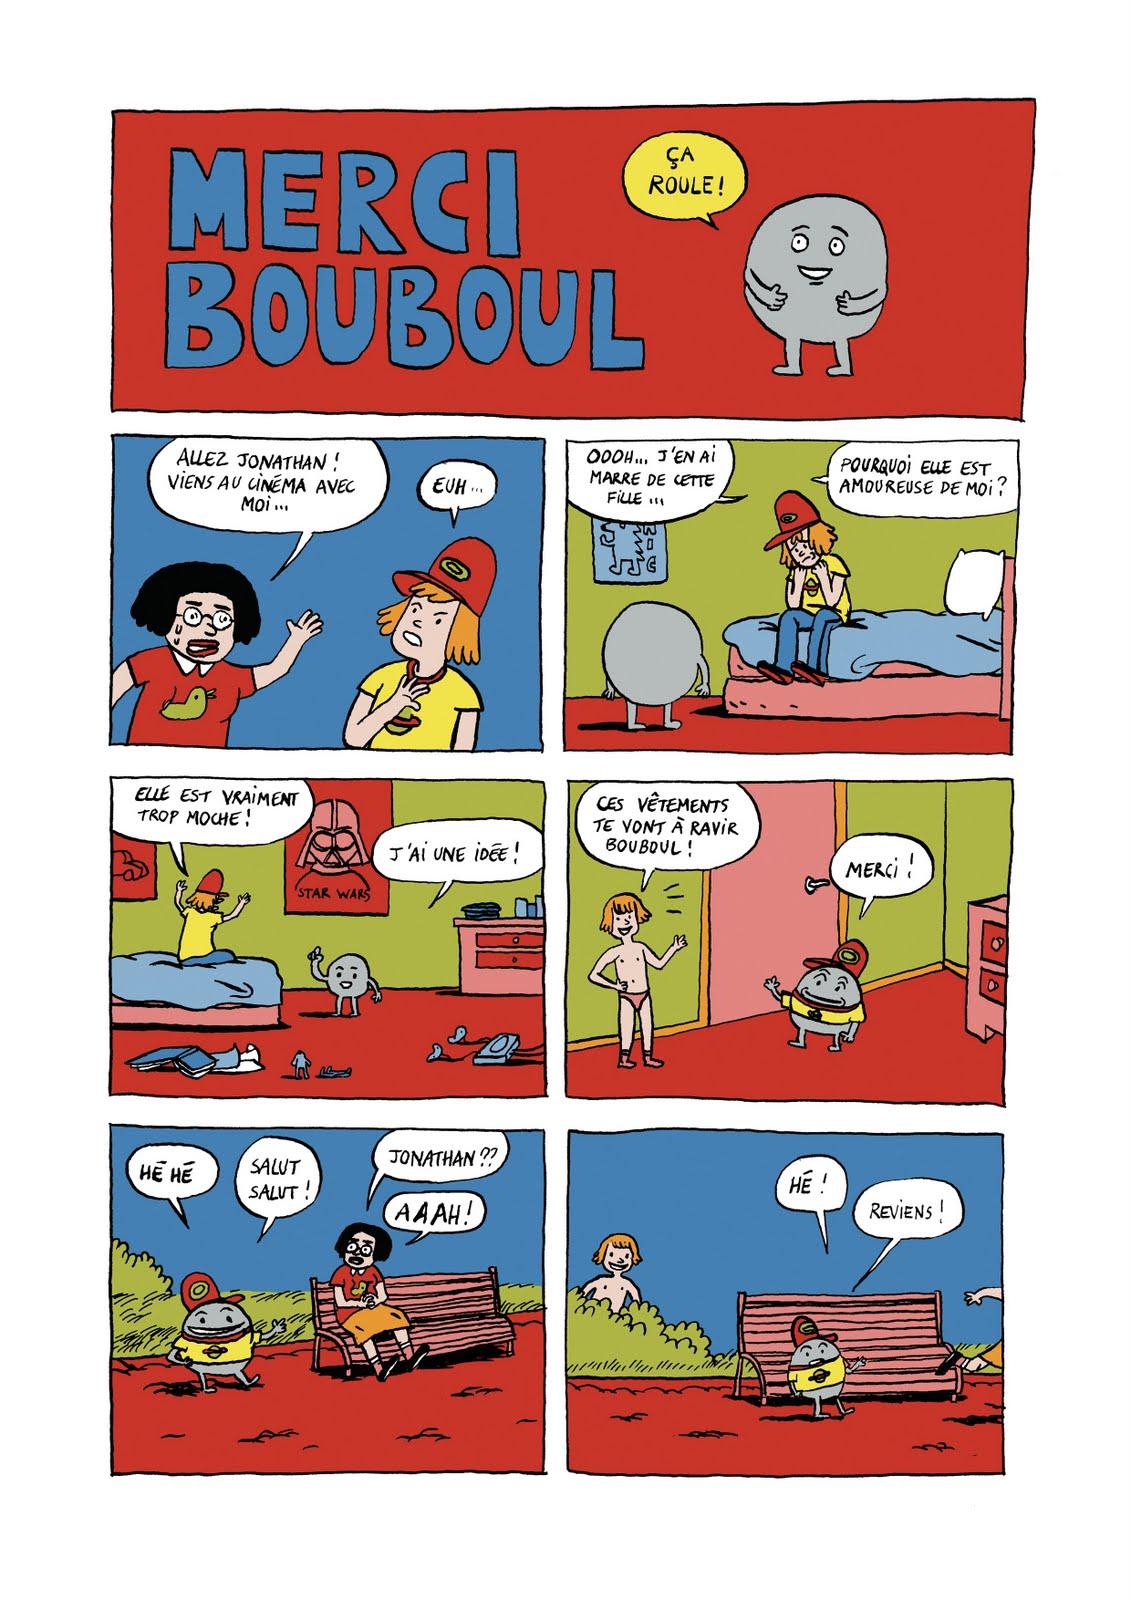 meci bouboul